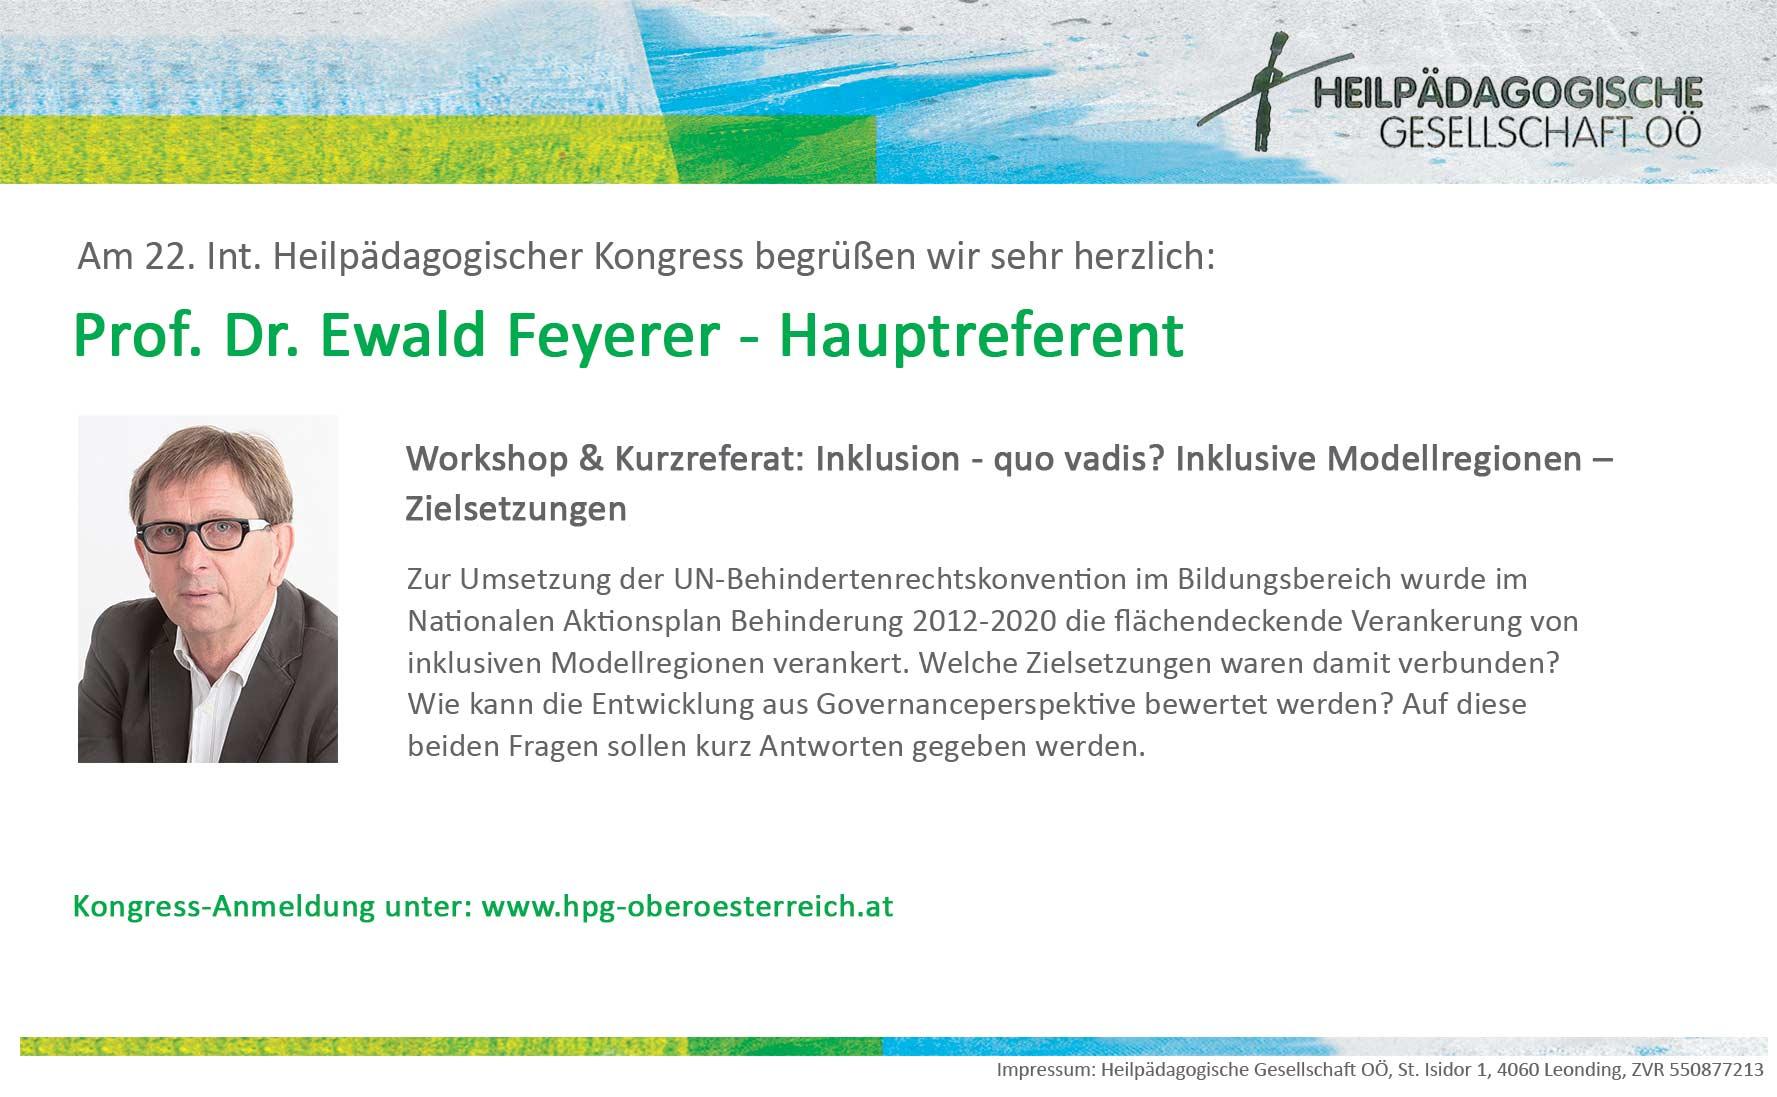 Ewald Feyerer